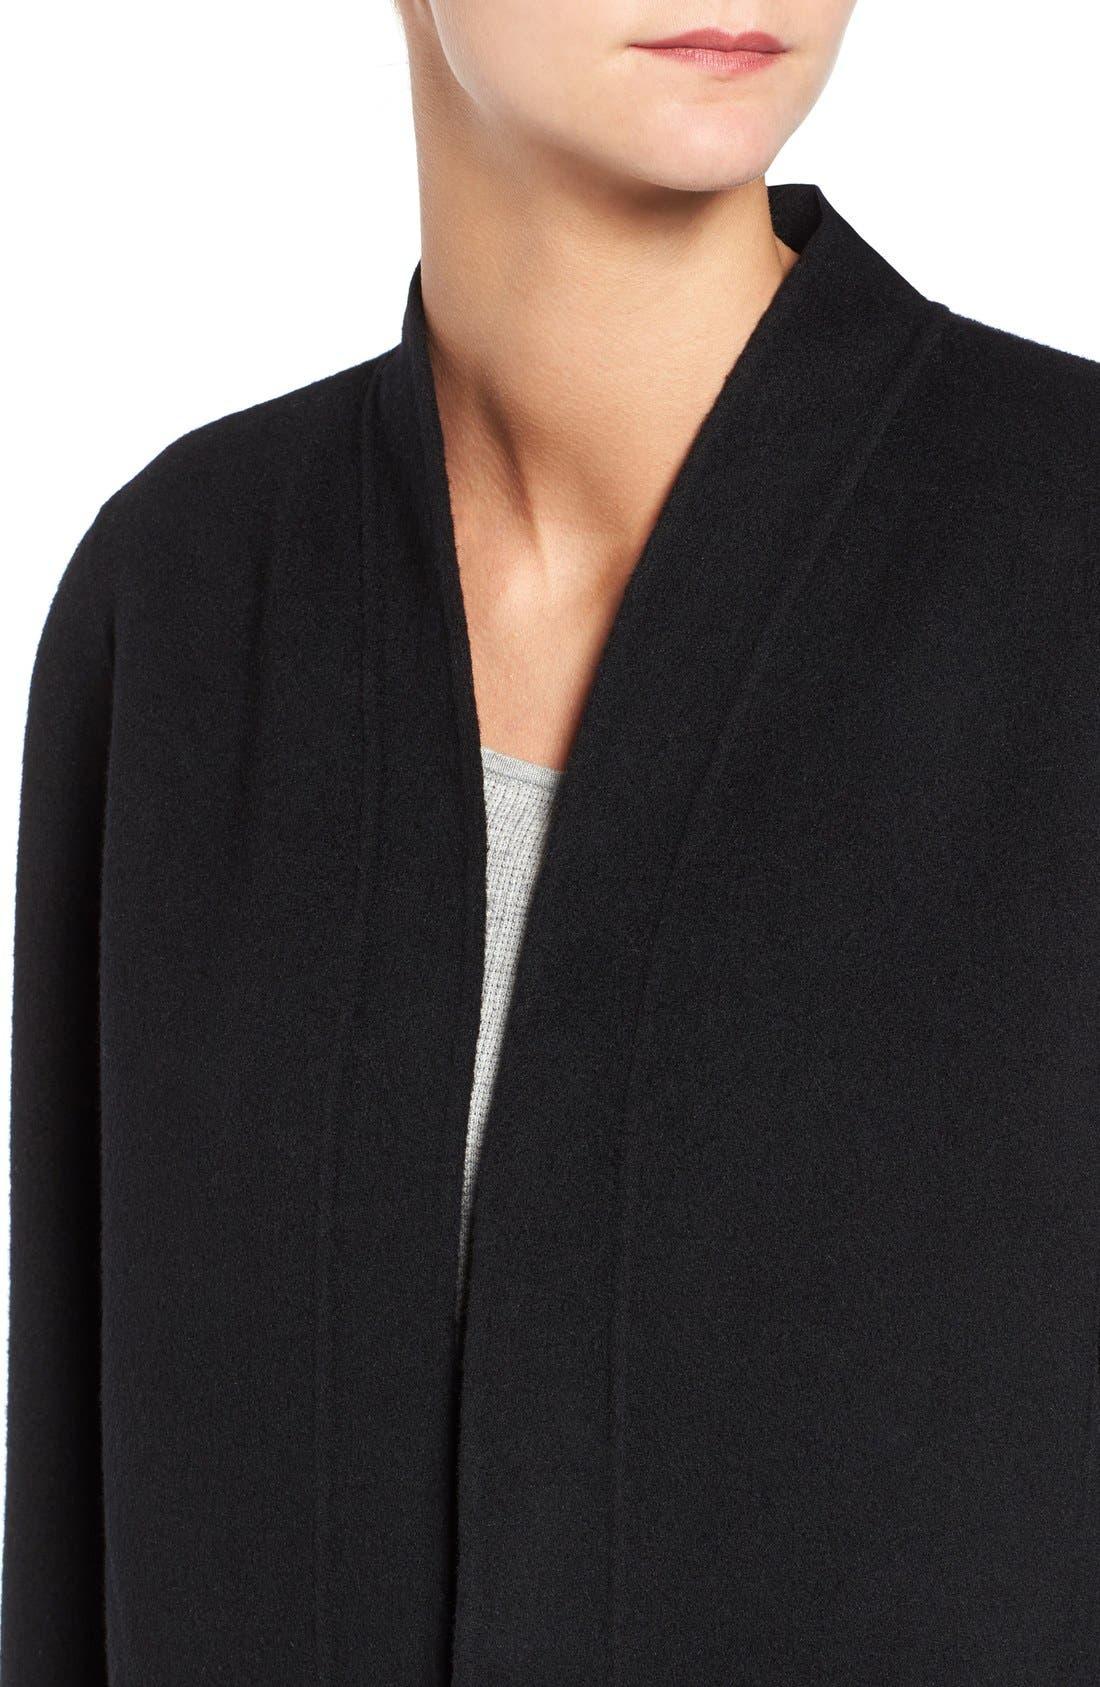 Double Face Brushed Wool Blend Kimono Jacket,                             Alternate thumbnail 2, color,                             001